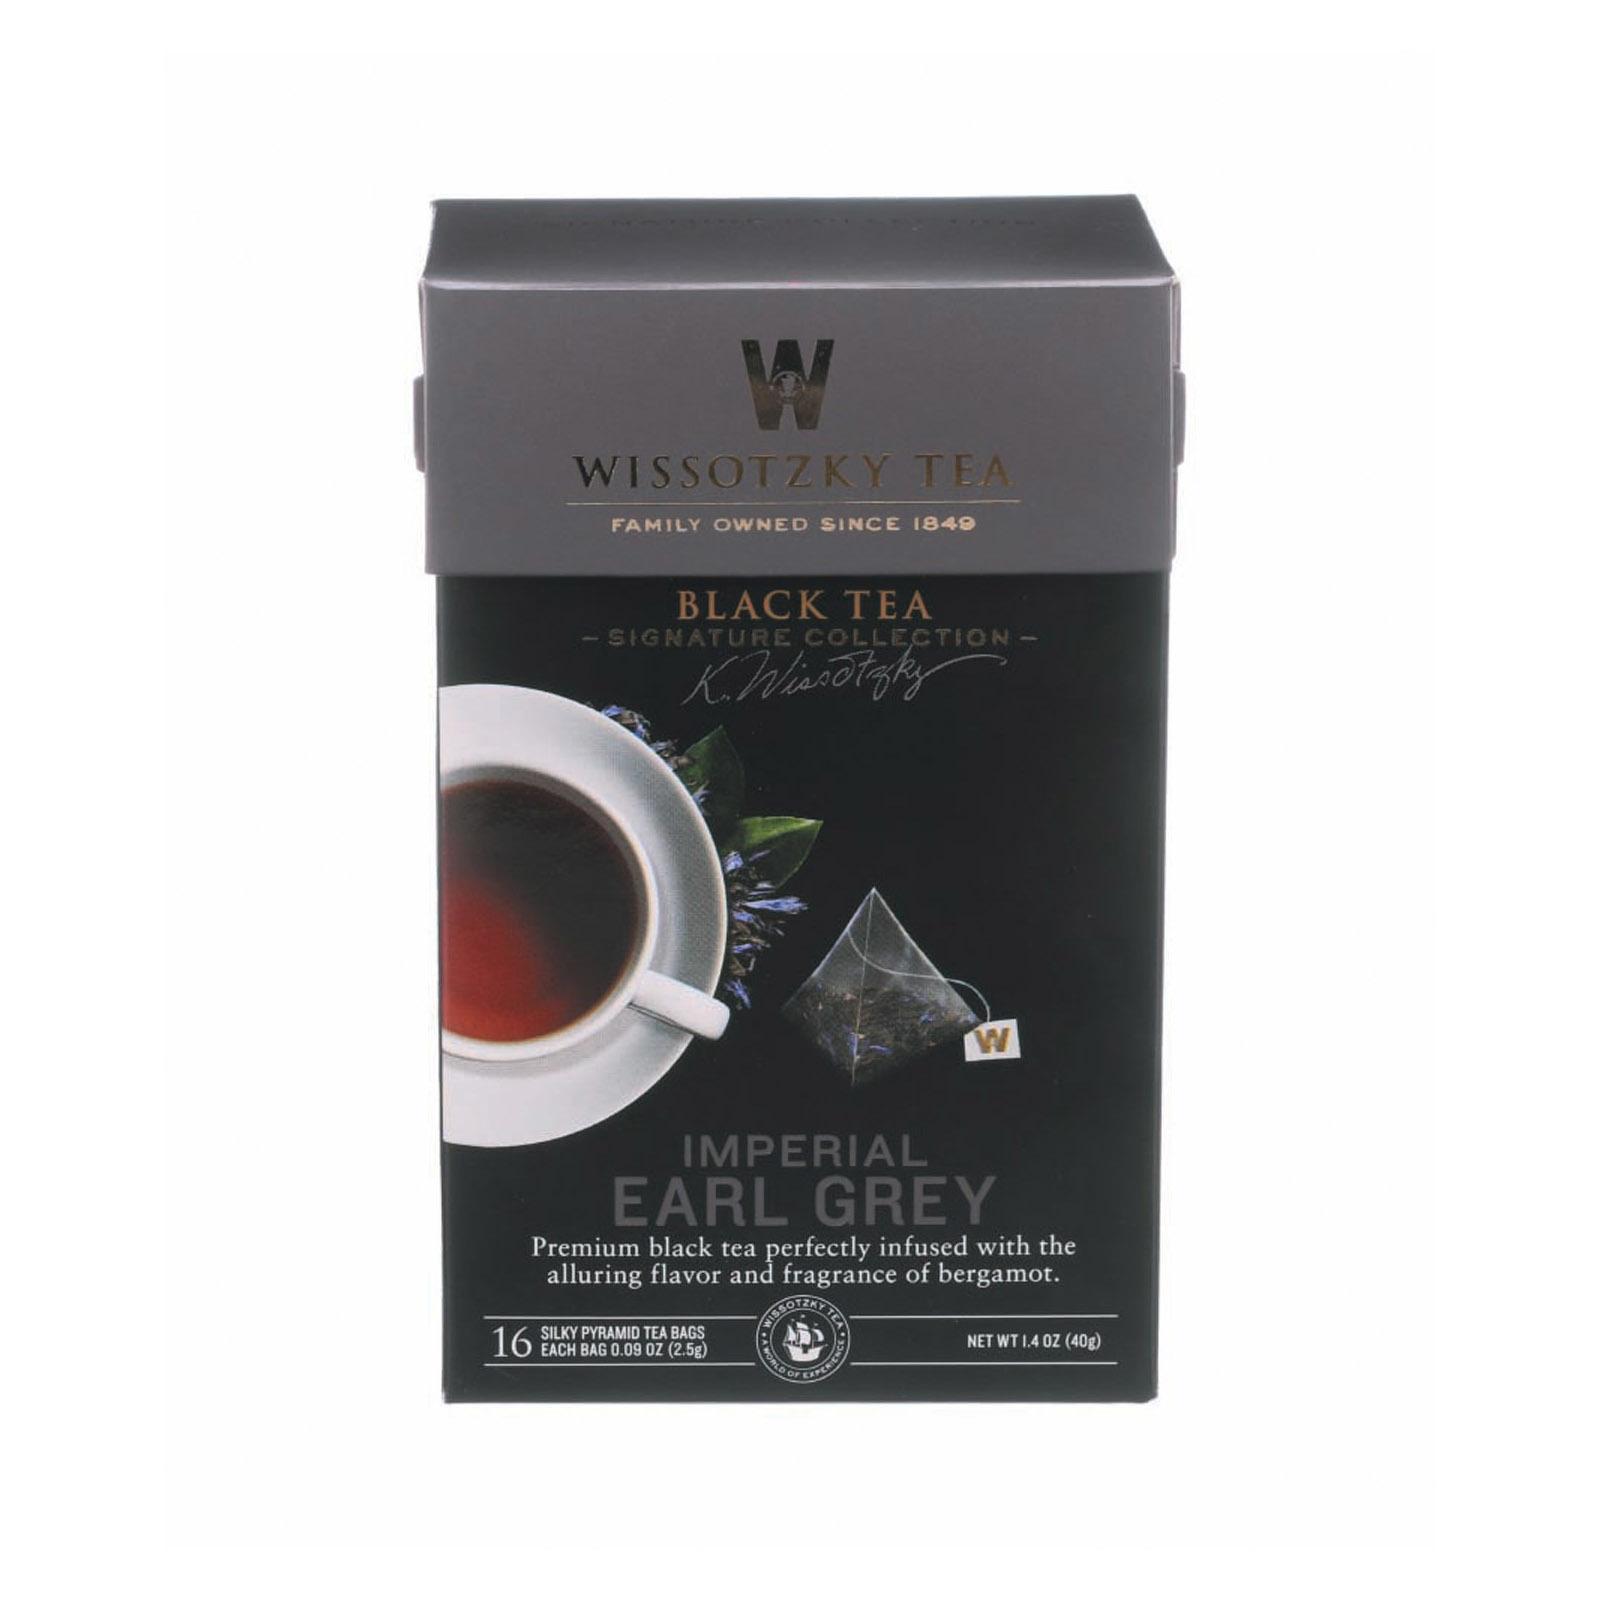 Wissotzky Tea - Imperial Earl Grey - Case of 6 - 16 BAG